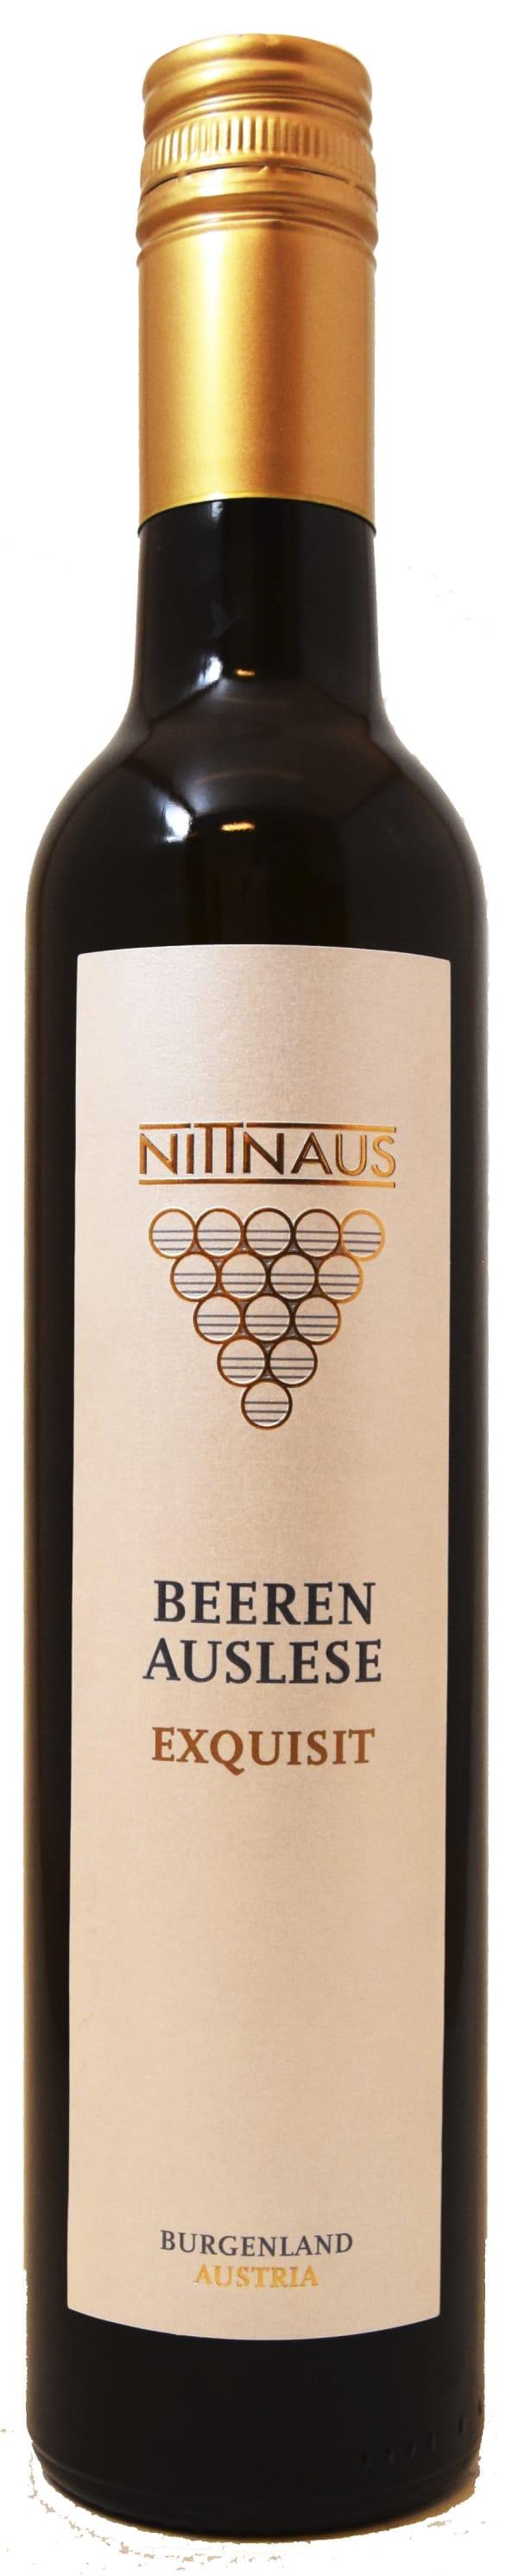 Nittnaus Beerenauslese Exquisit 2015